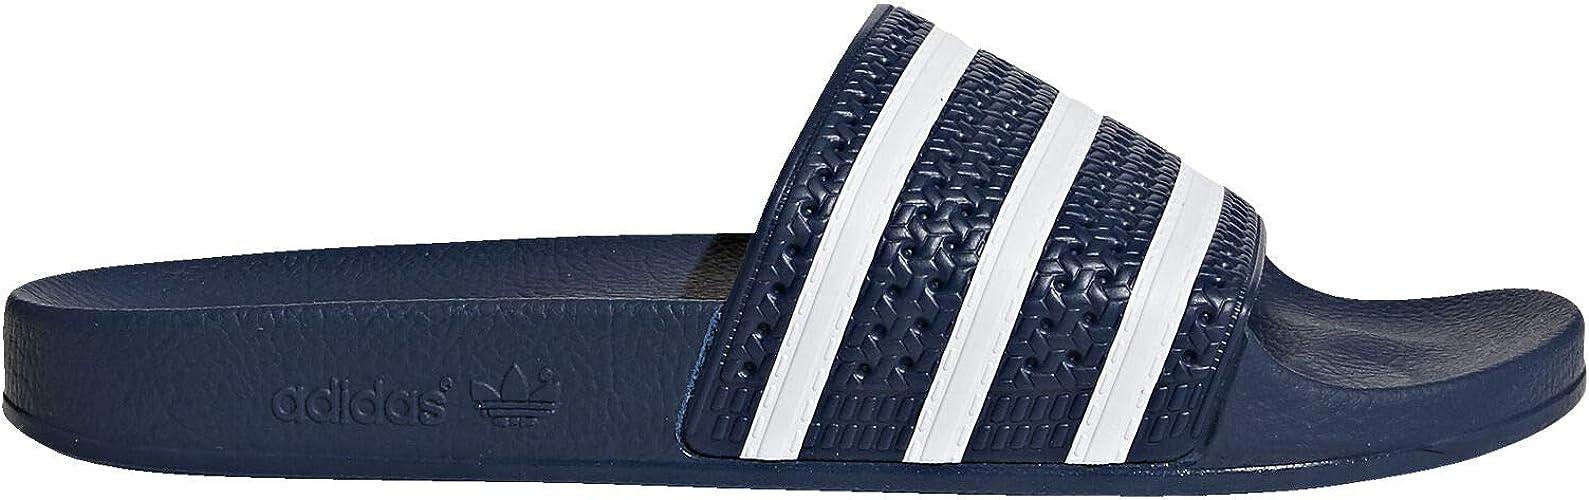 adidas Originals Adilette white and black slider